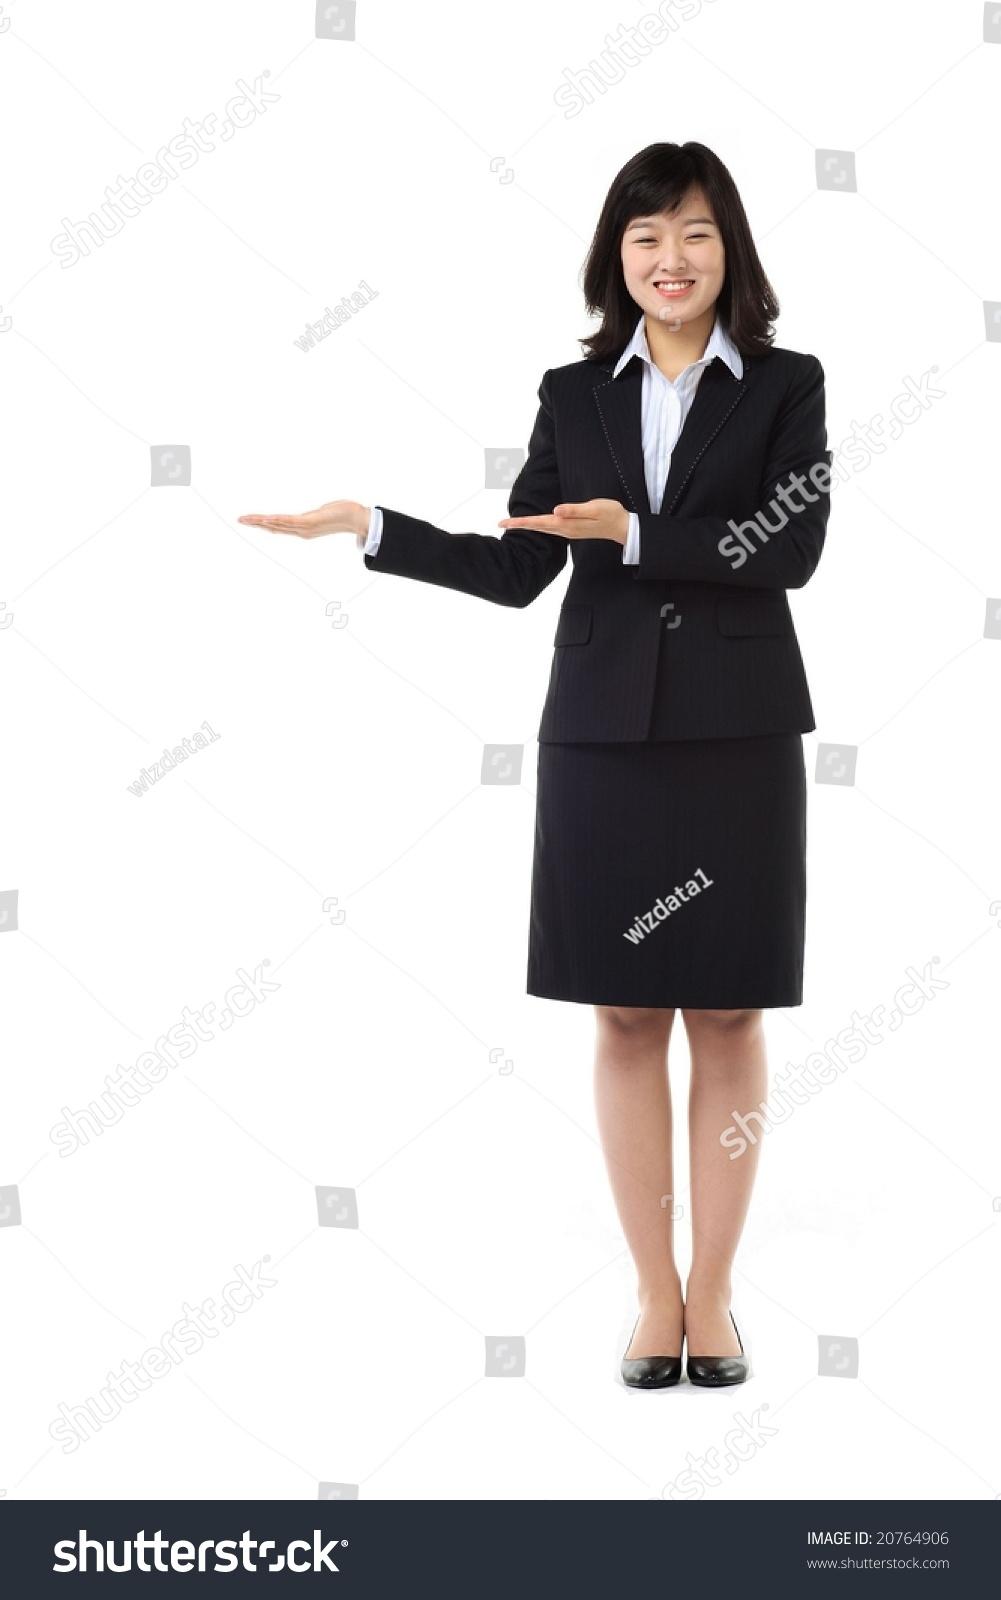 career w stock photo shutterstock career w